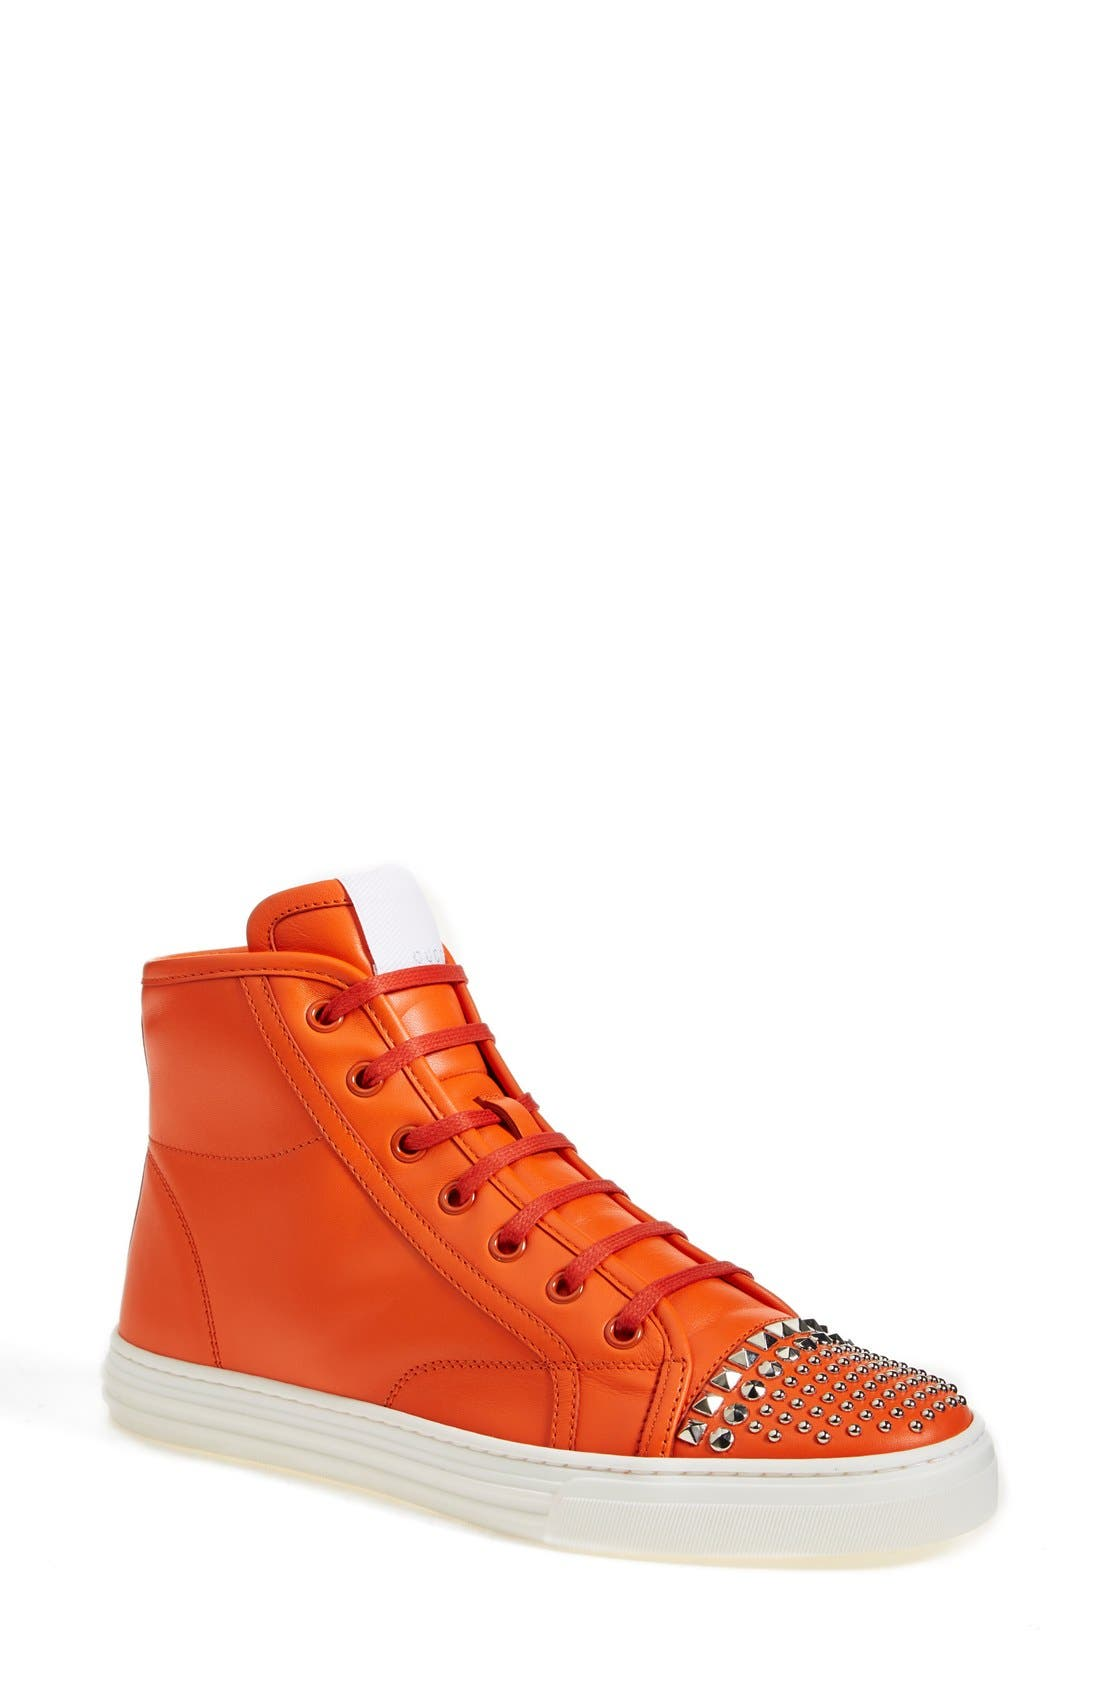 Alternate Image 1 Selected - Gucci 'California' Studded Sneaker (Women)